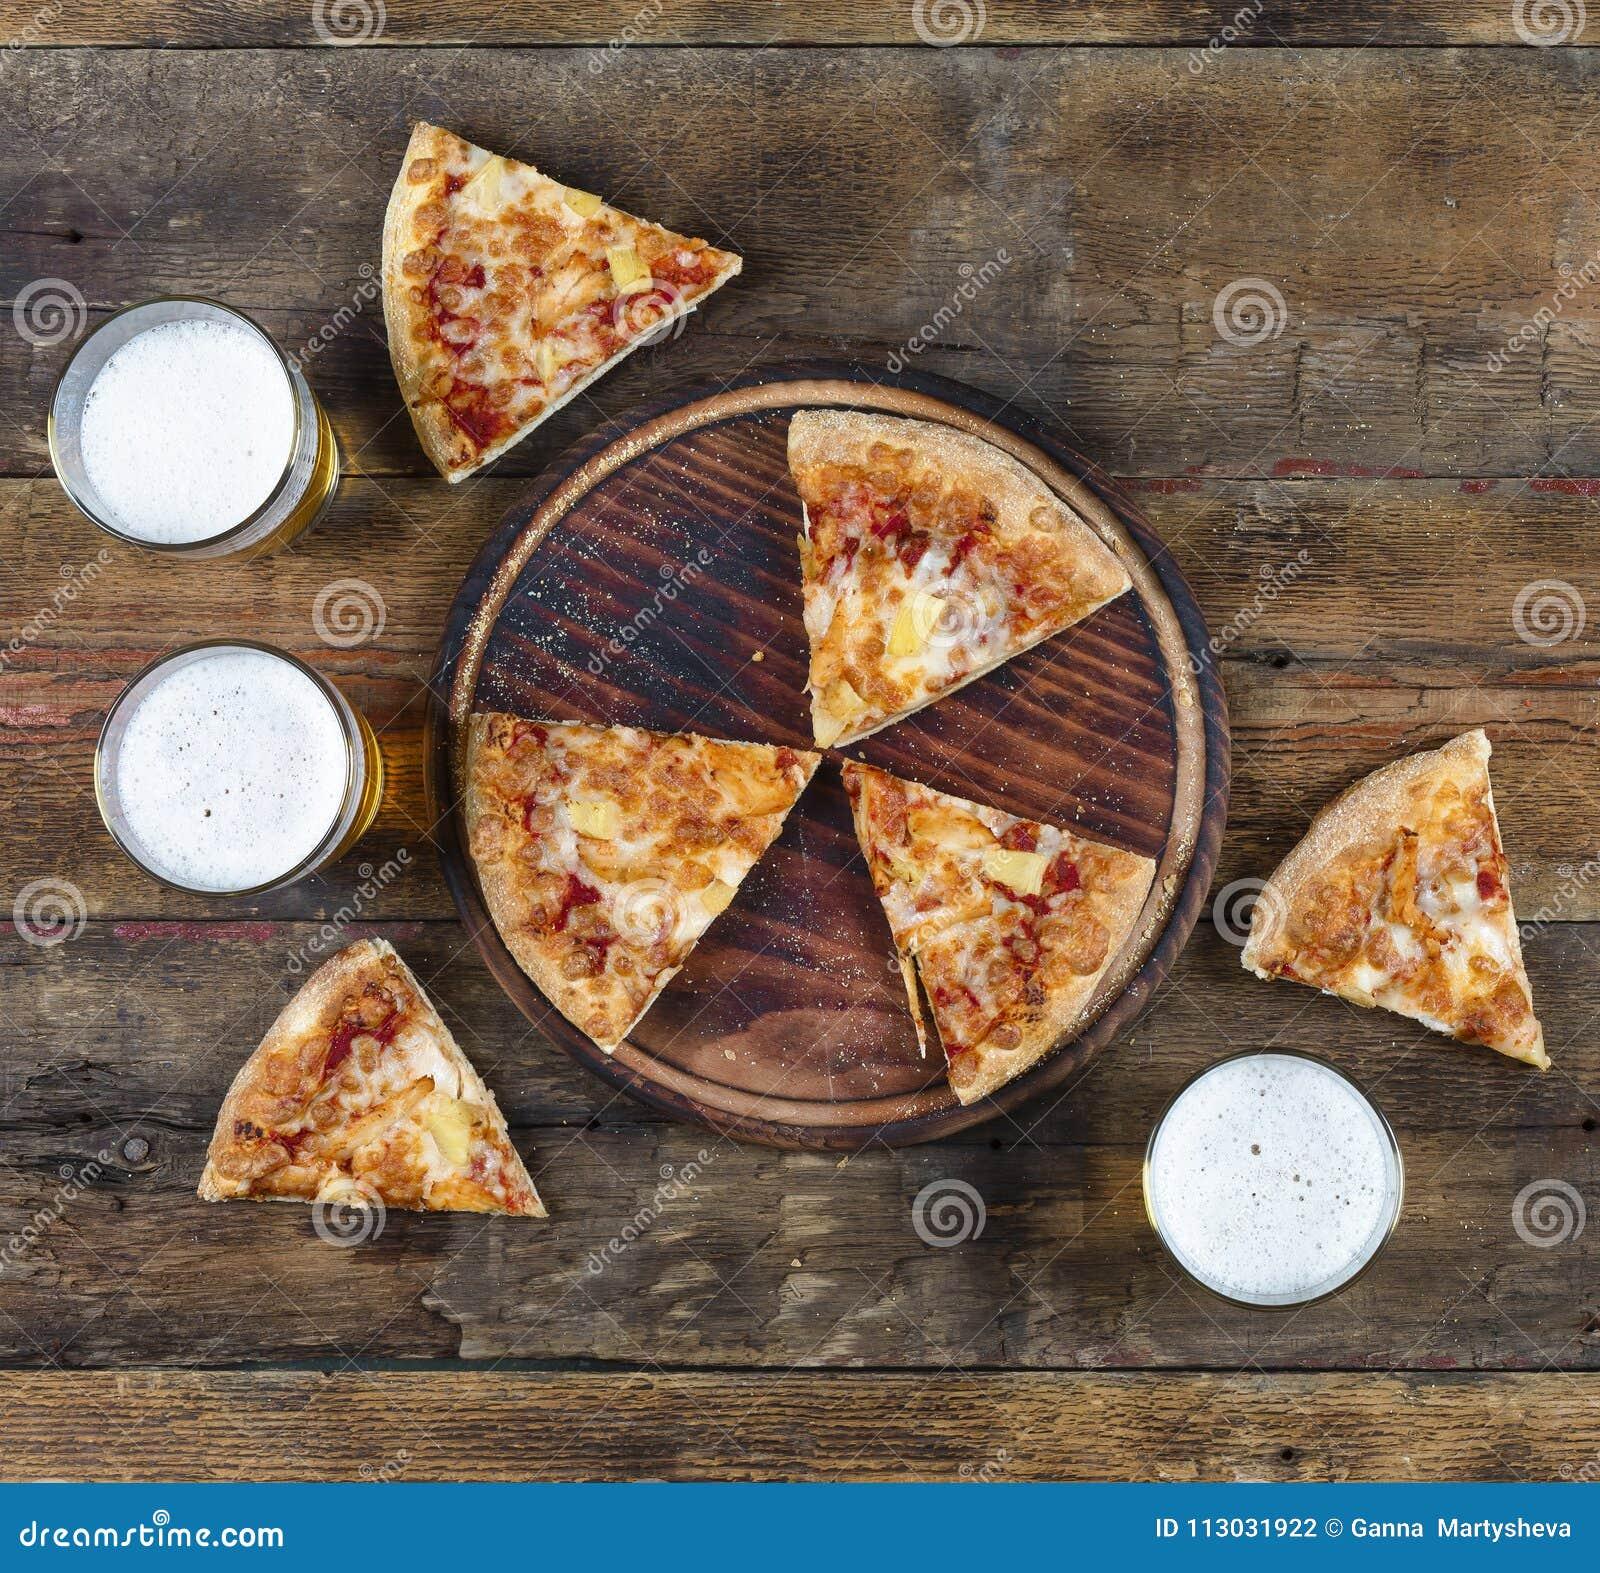 Salchichones, pizza, italiano, cerveza, comida, sabrosa, comida, vidrio, delic